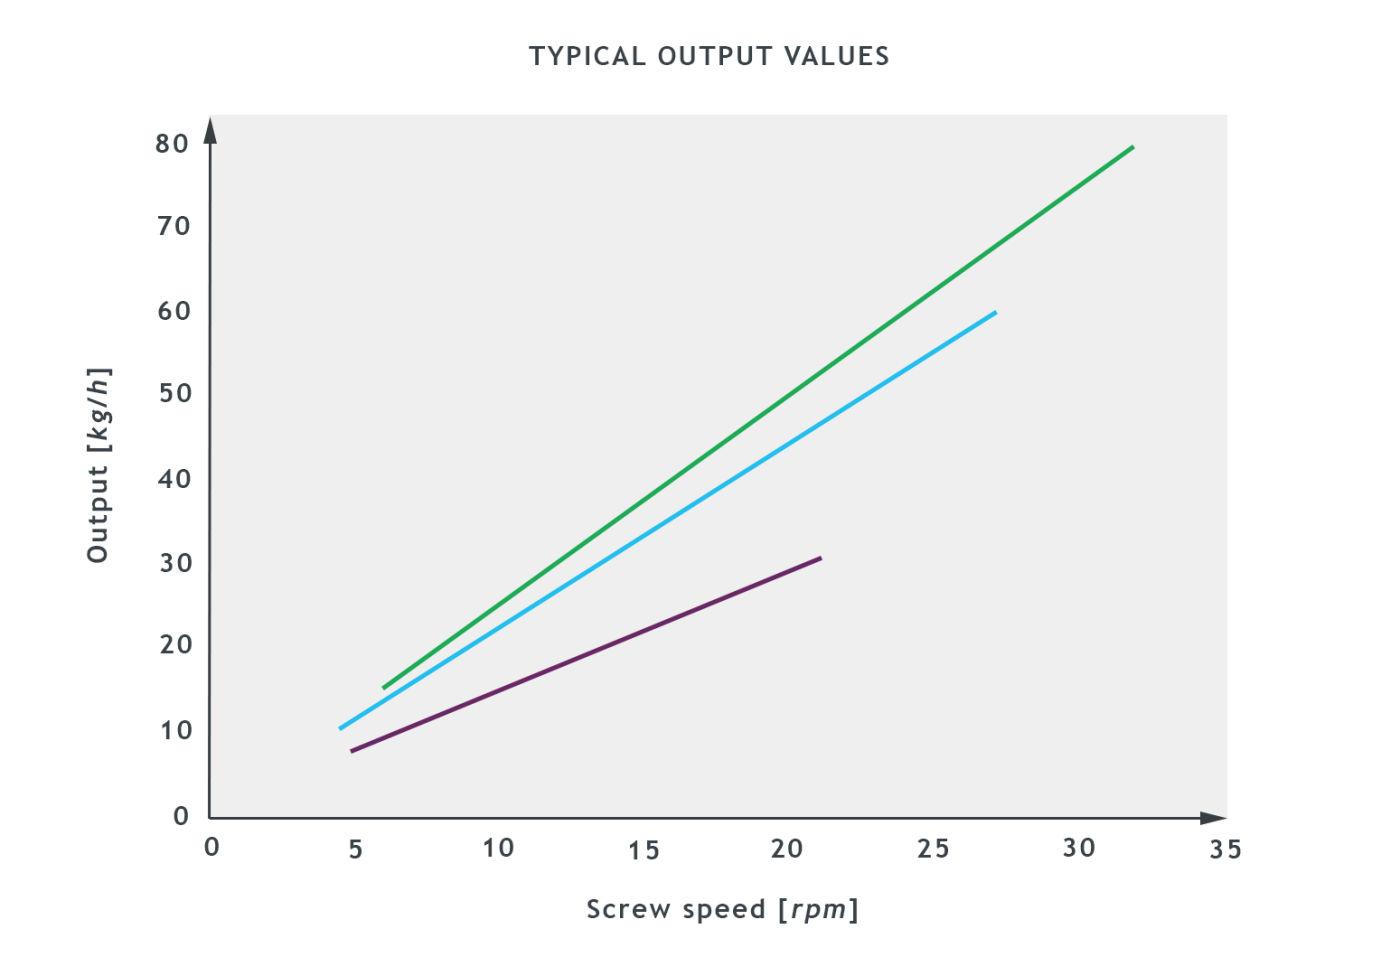 MXI80_20D_SB0102157_Output_graph1.jpg